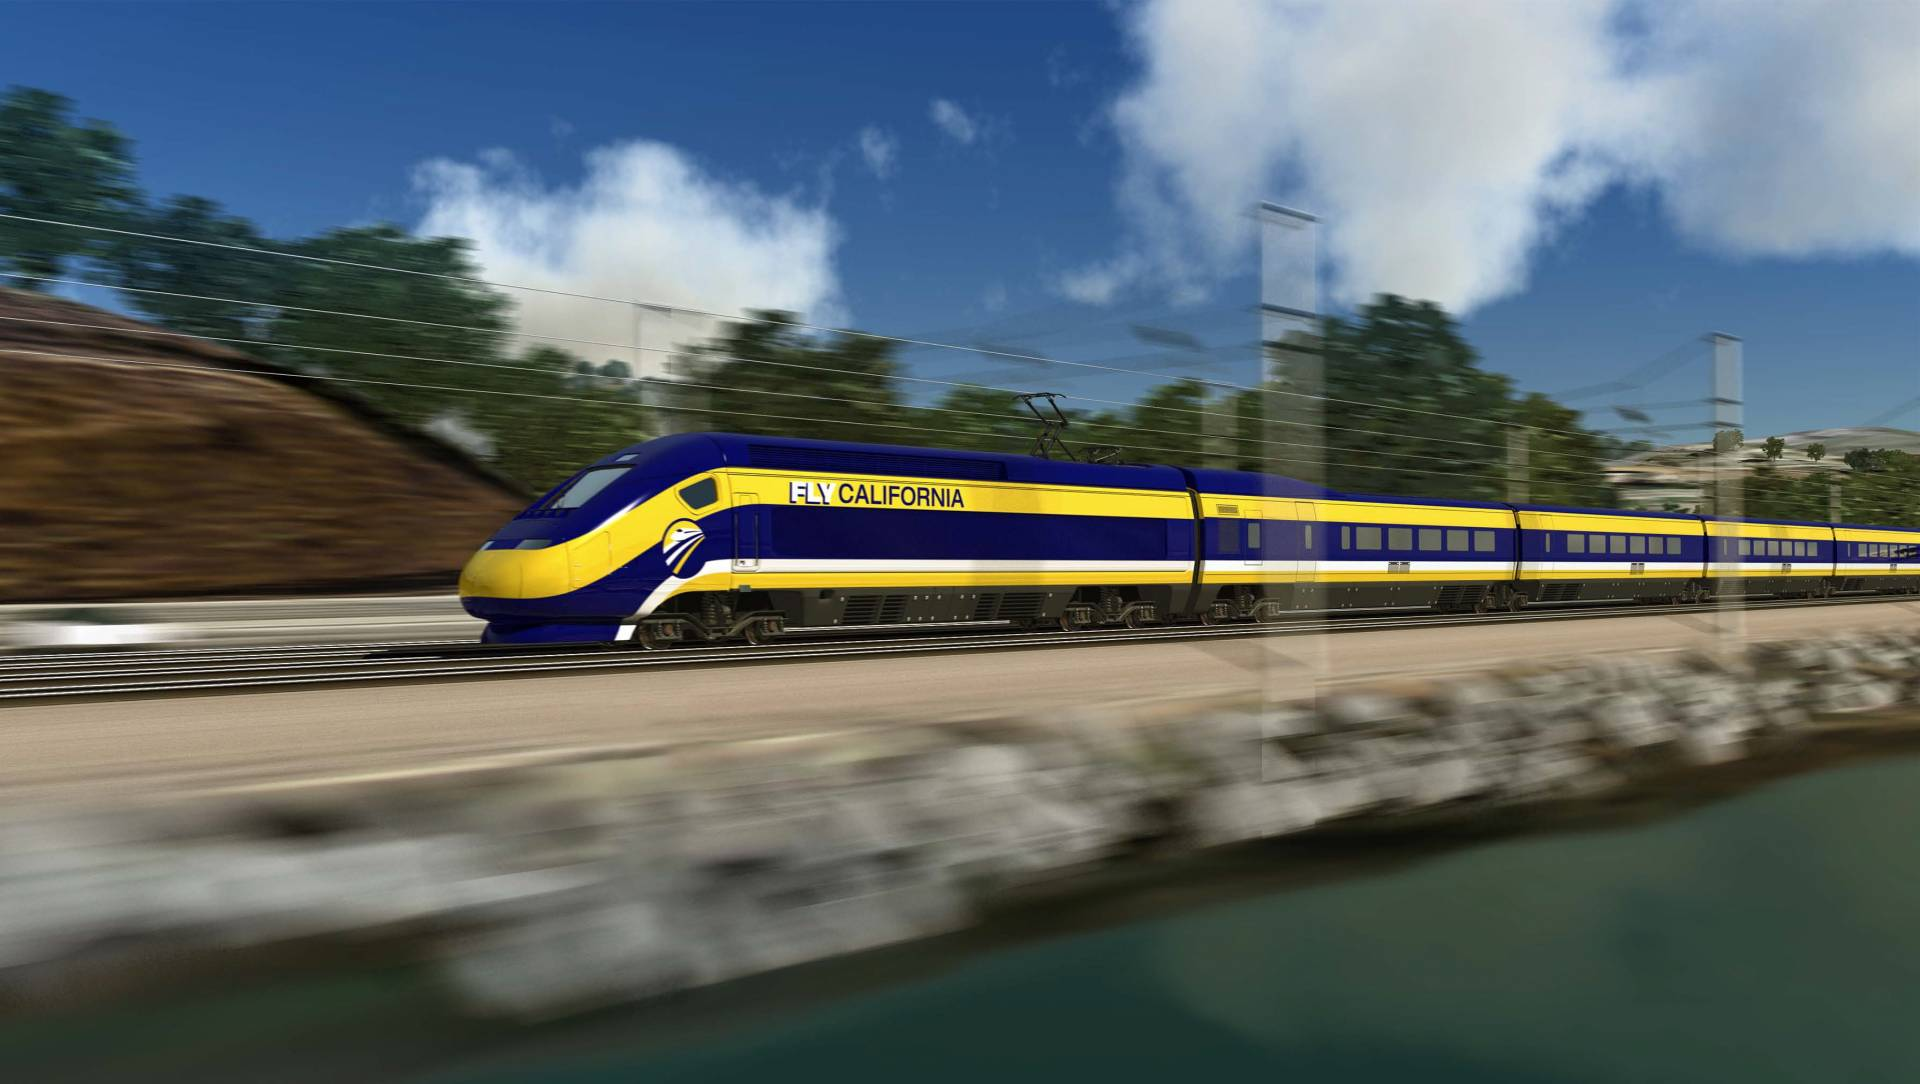 Recreación virtual de uno de los trenes que surcarán 1.300 kilómetros íntegramente en California.